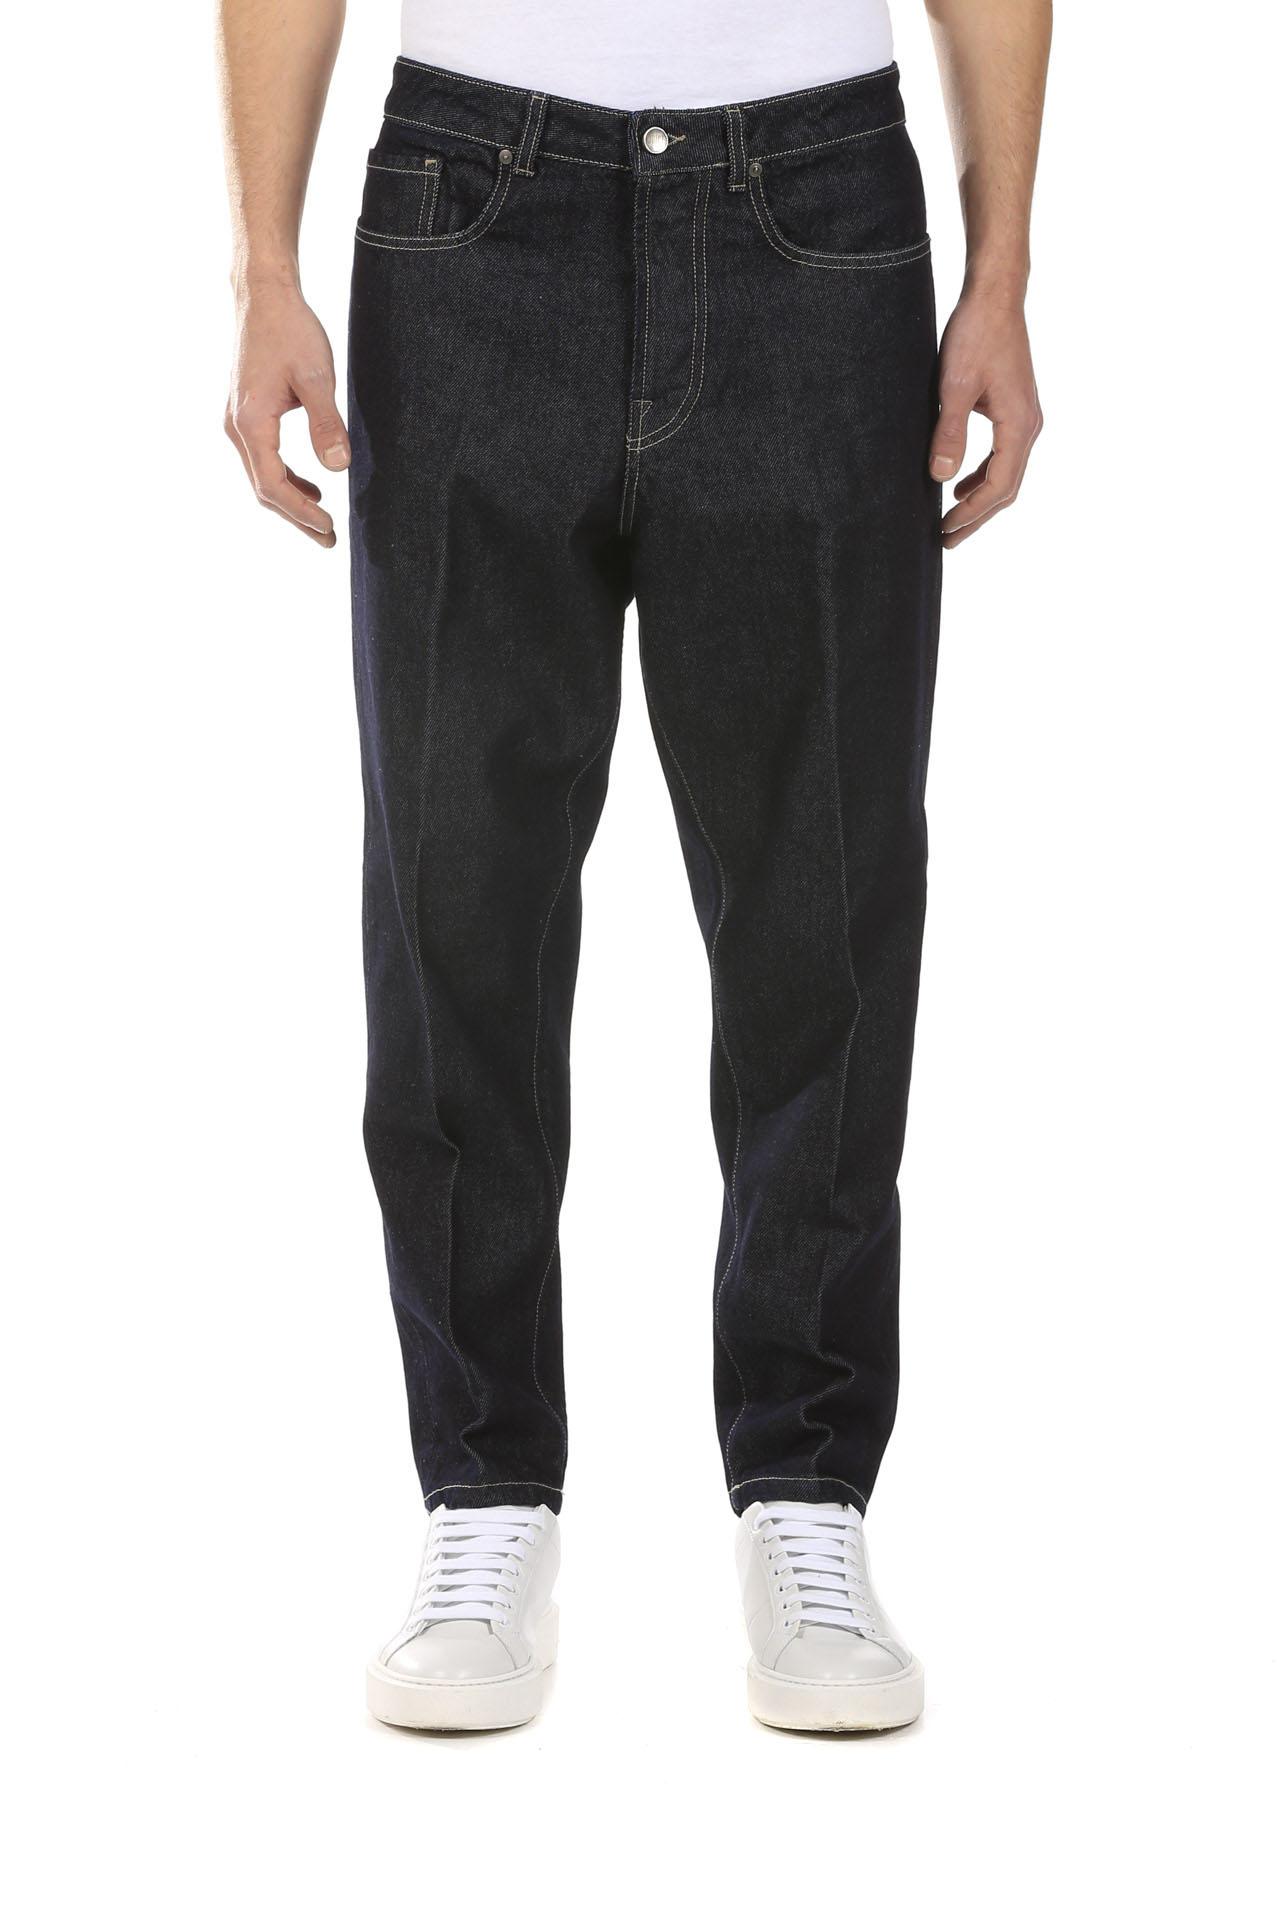 Jeans basic 3DICI | Jeans | POCKETDENIM